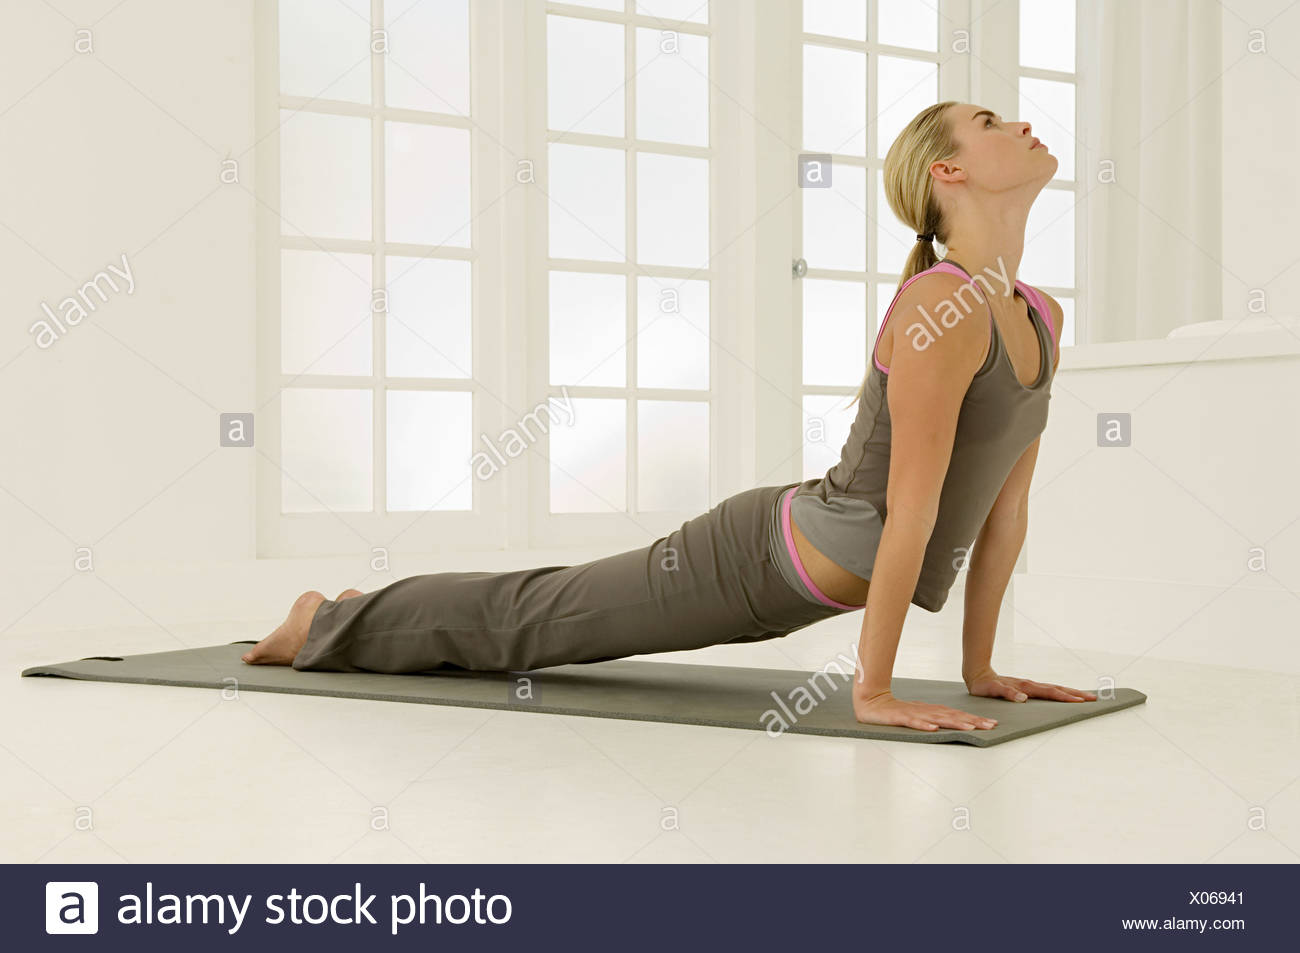 Woman in cobra pose - Stock Image